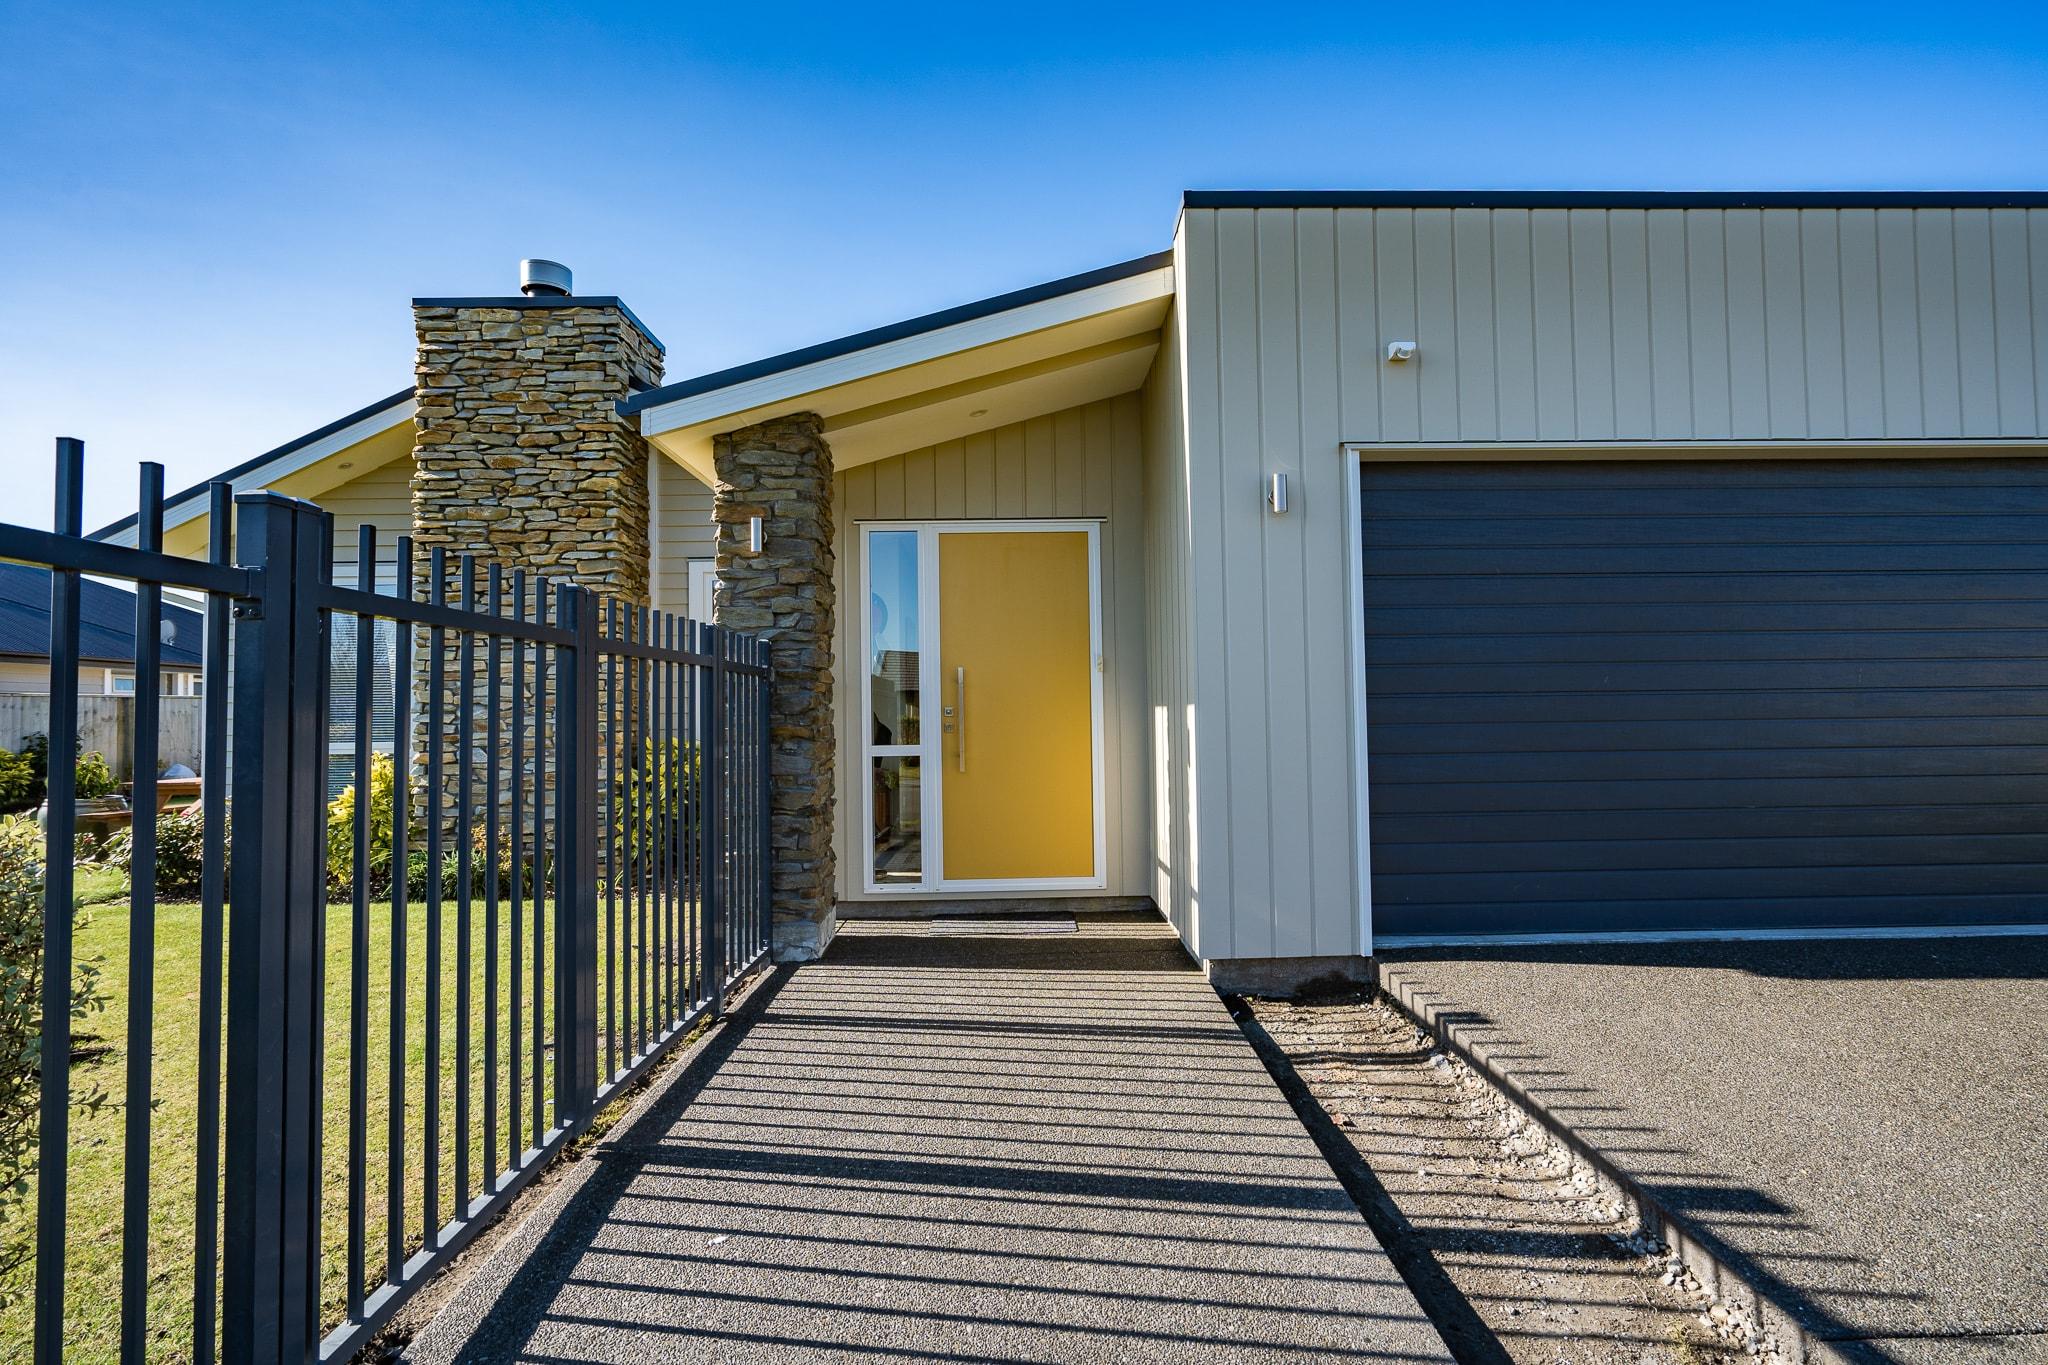 robertson_building_canterbury_ltd_ballarat_small_24-min.jpg